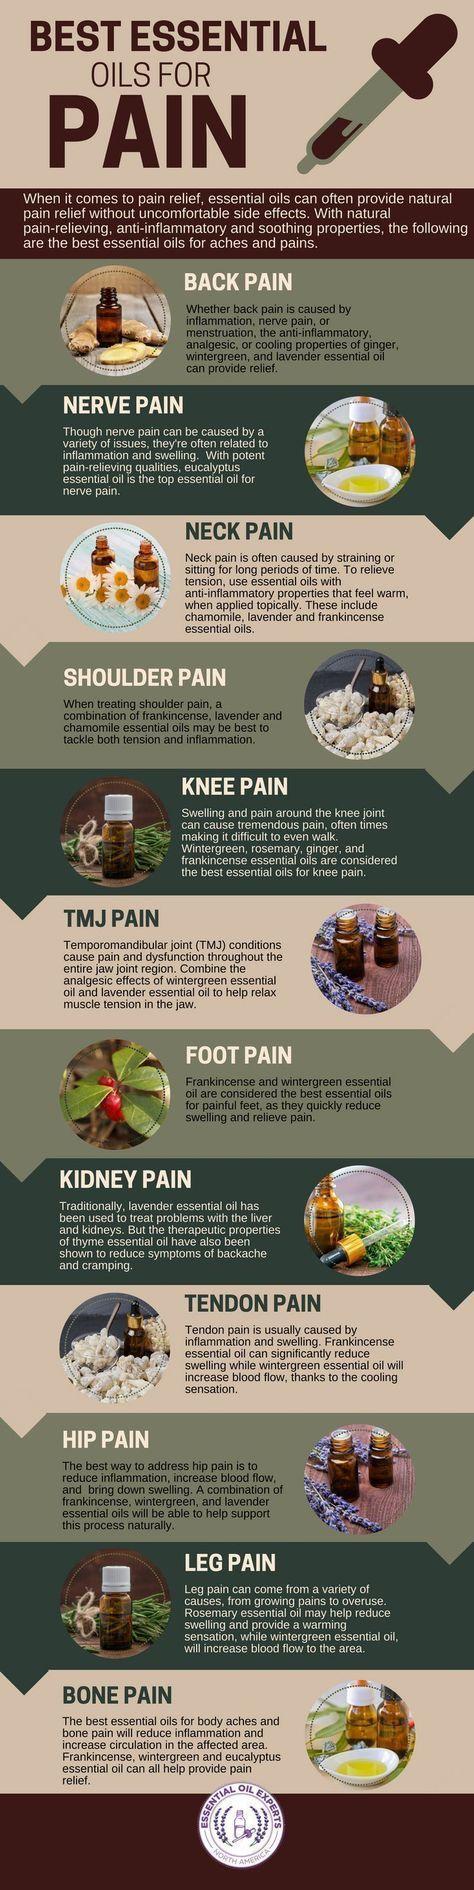 Best Essential Oils for Pain Management - Back, Nerve, Neck, Shoulder & Knee http://www.wartalooza.com/general-information/wart-removal-options-available-over-the-counter